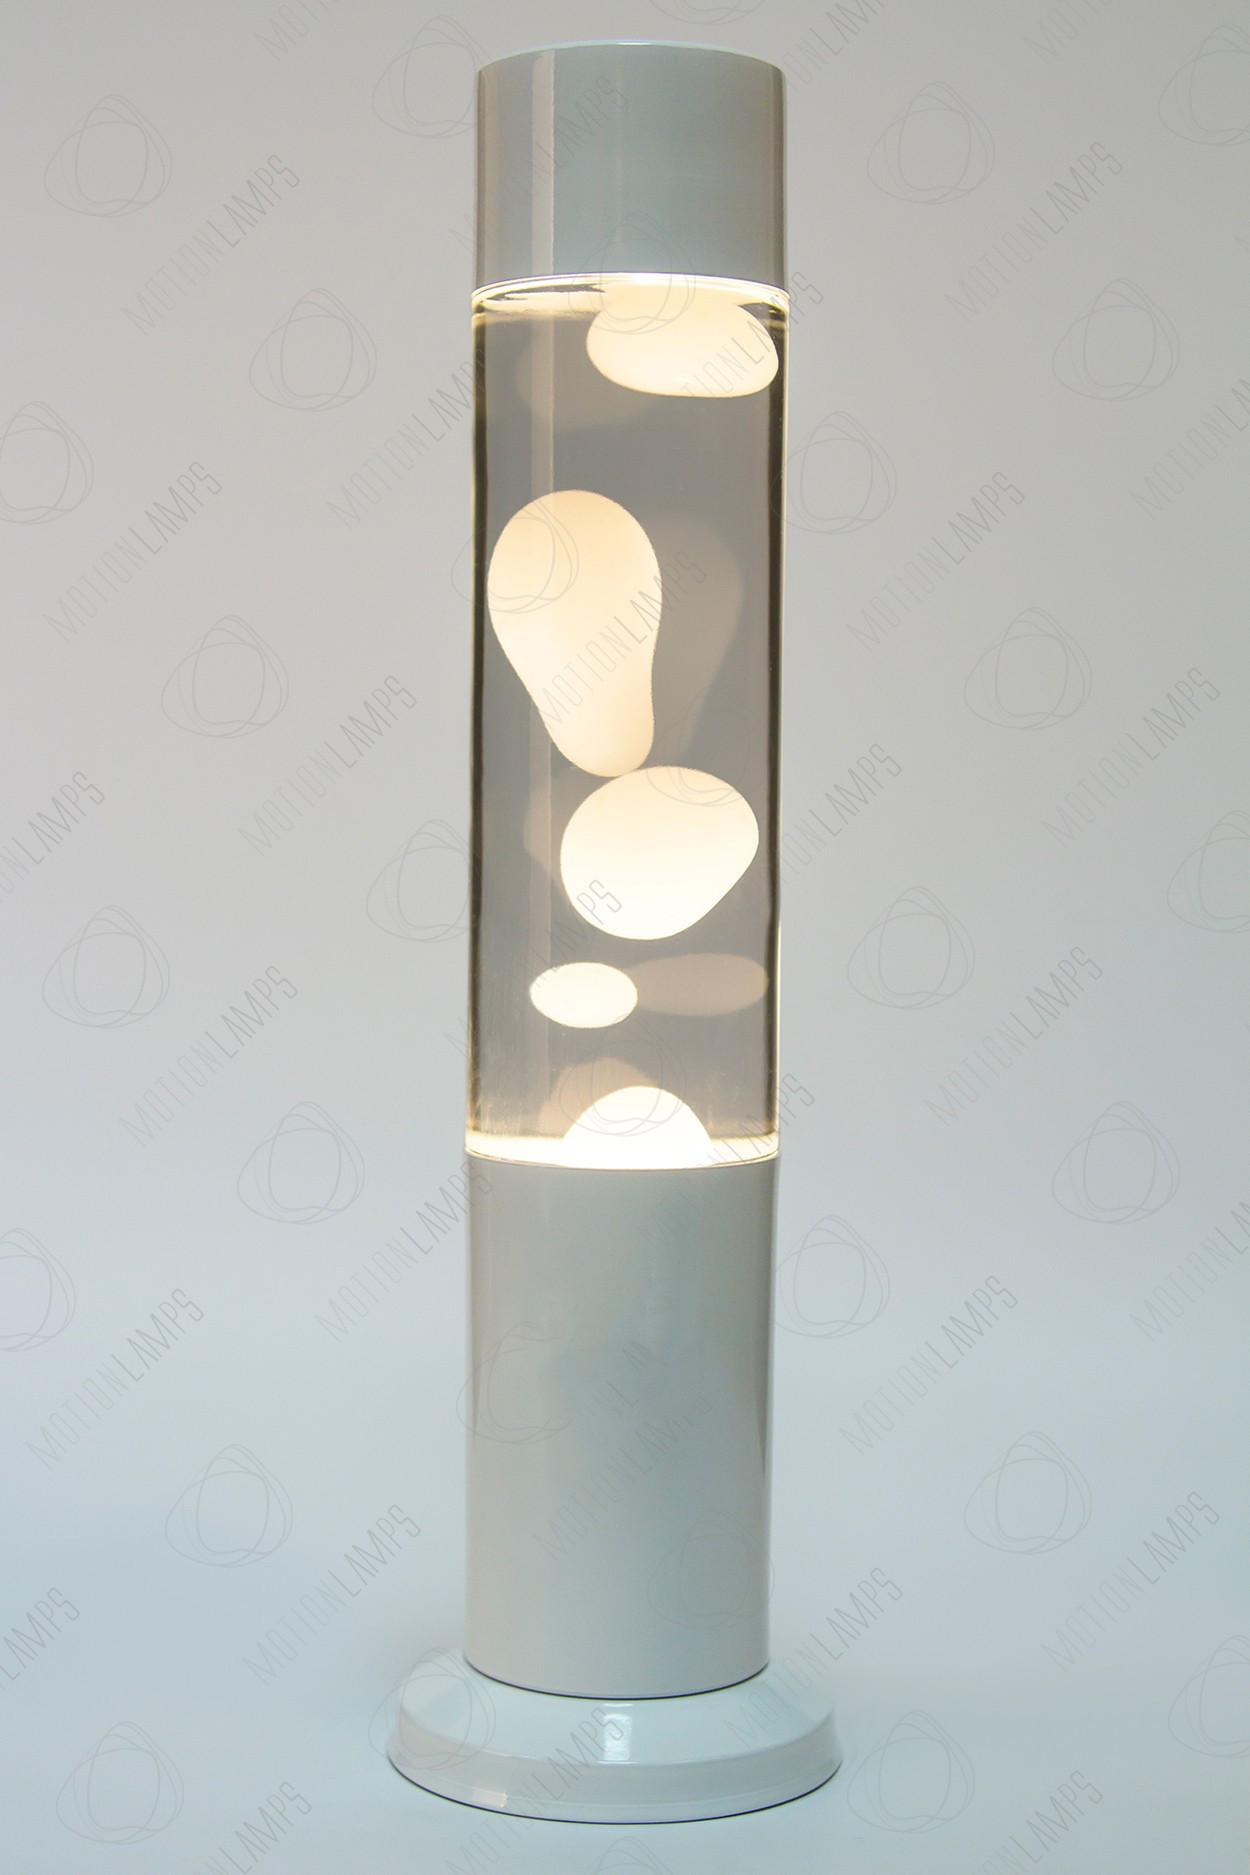 Лава-лампа 38см  Белая/Прозрачная (Воск)